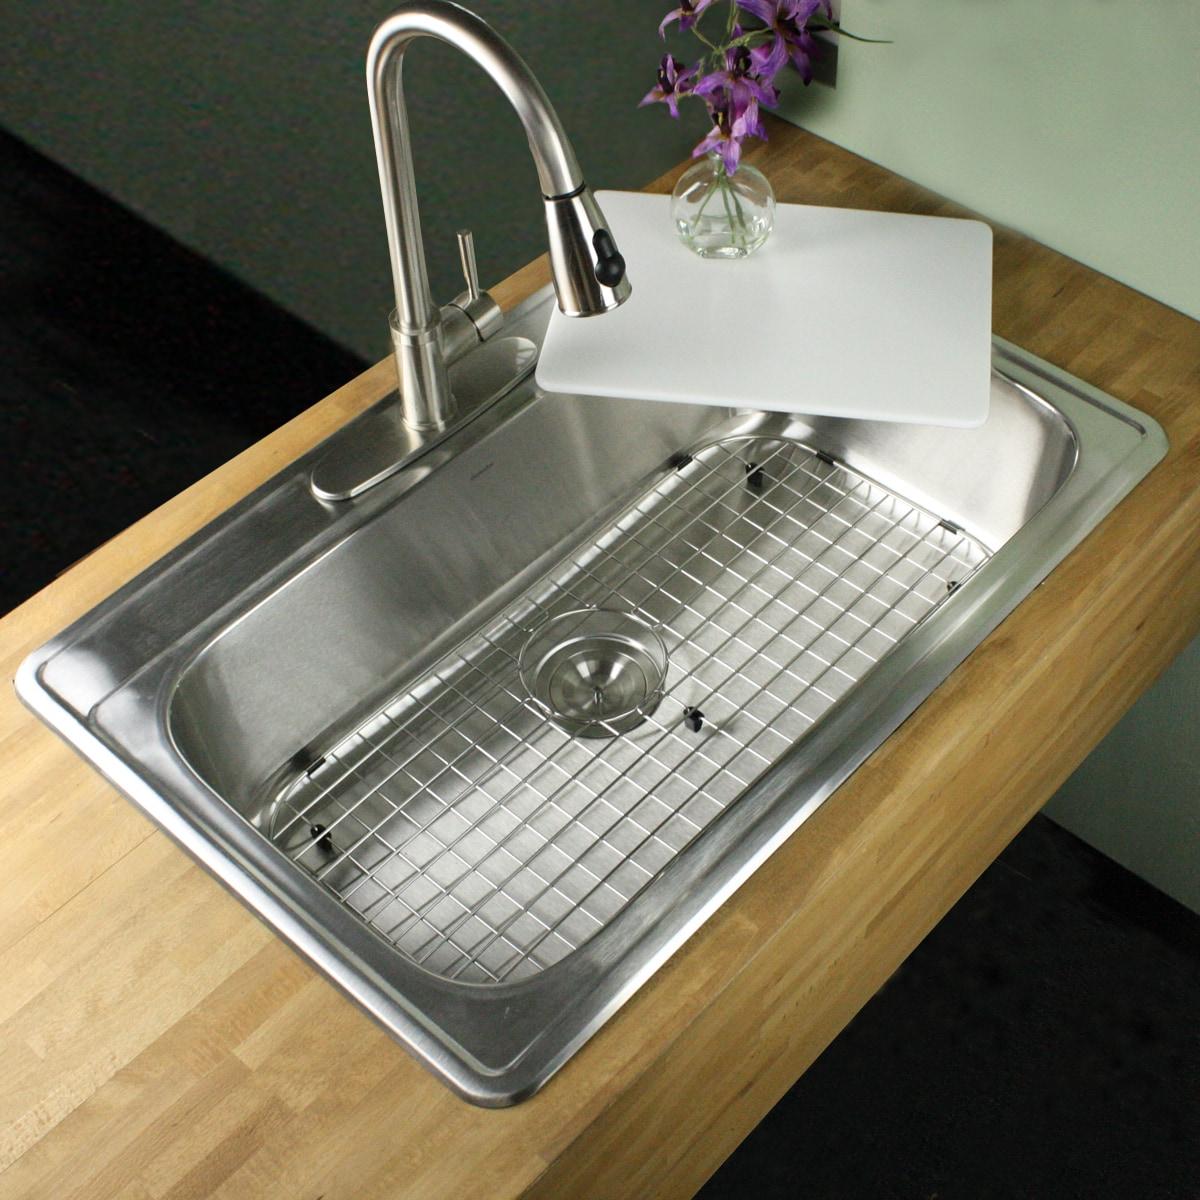 Kitchen Sink Cutting Board 33 Inch 18 Gauge Stainless Steel Drop In Single  Bowl